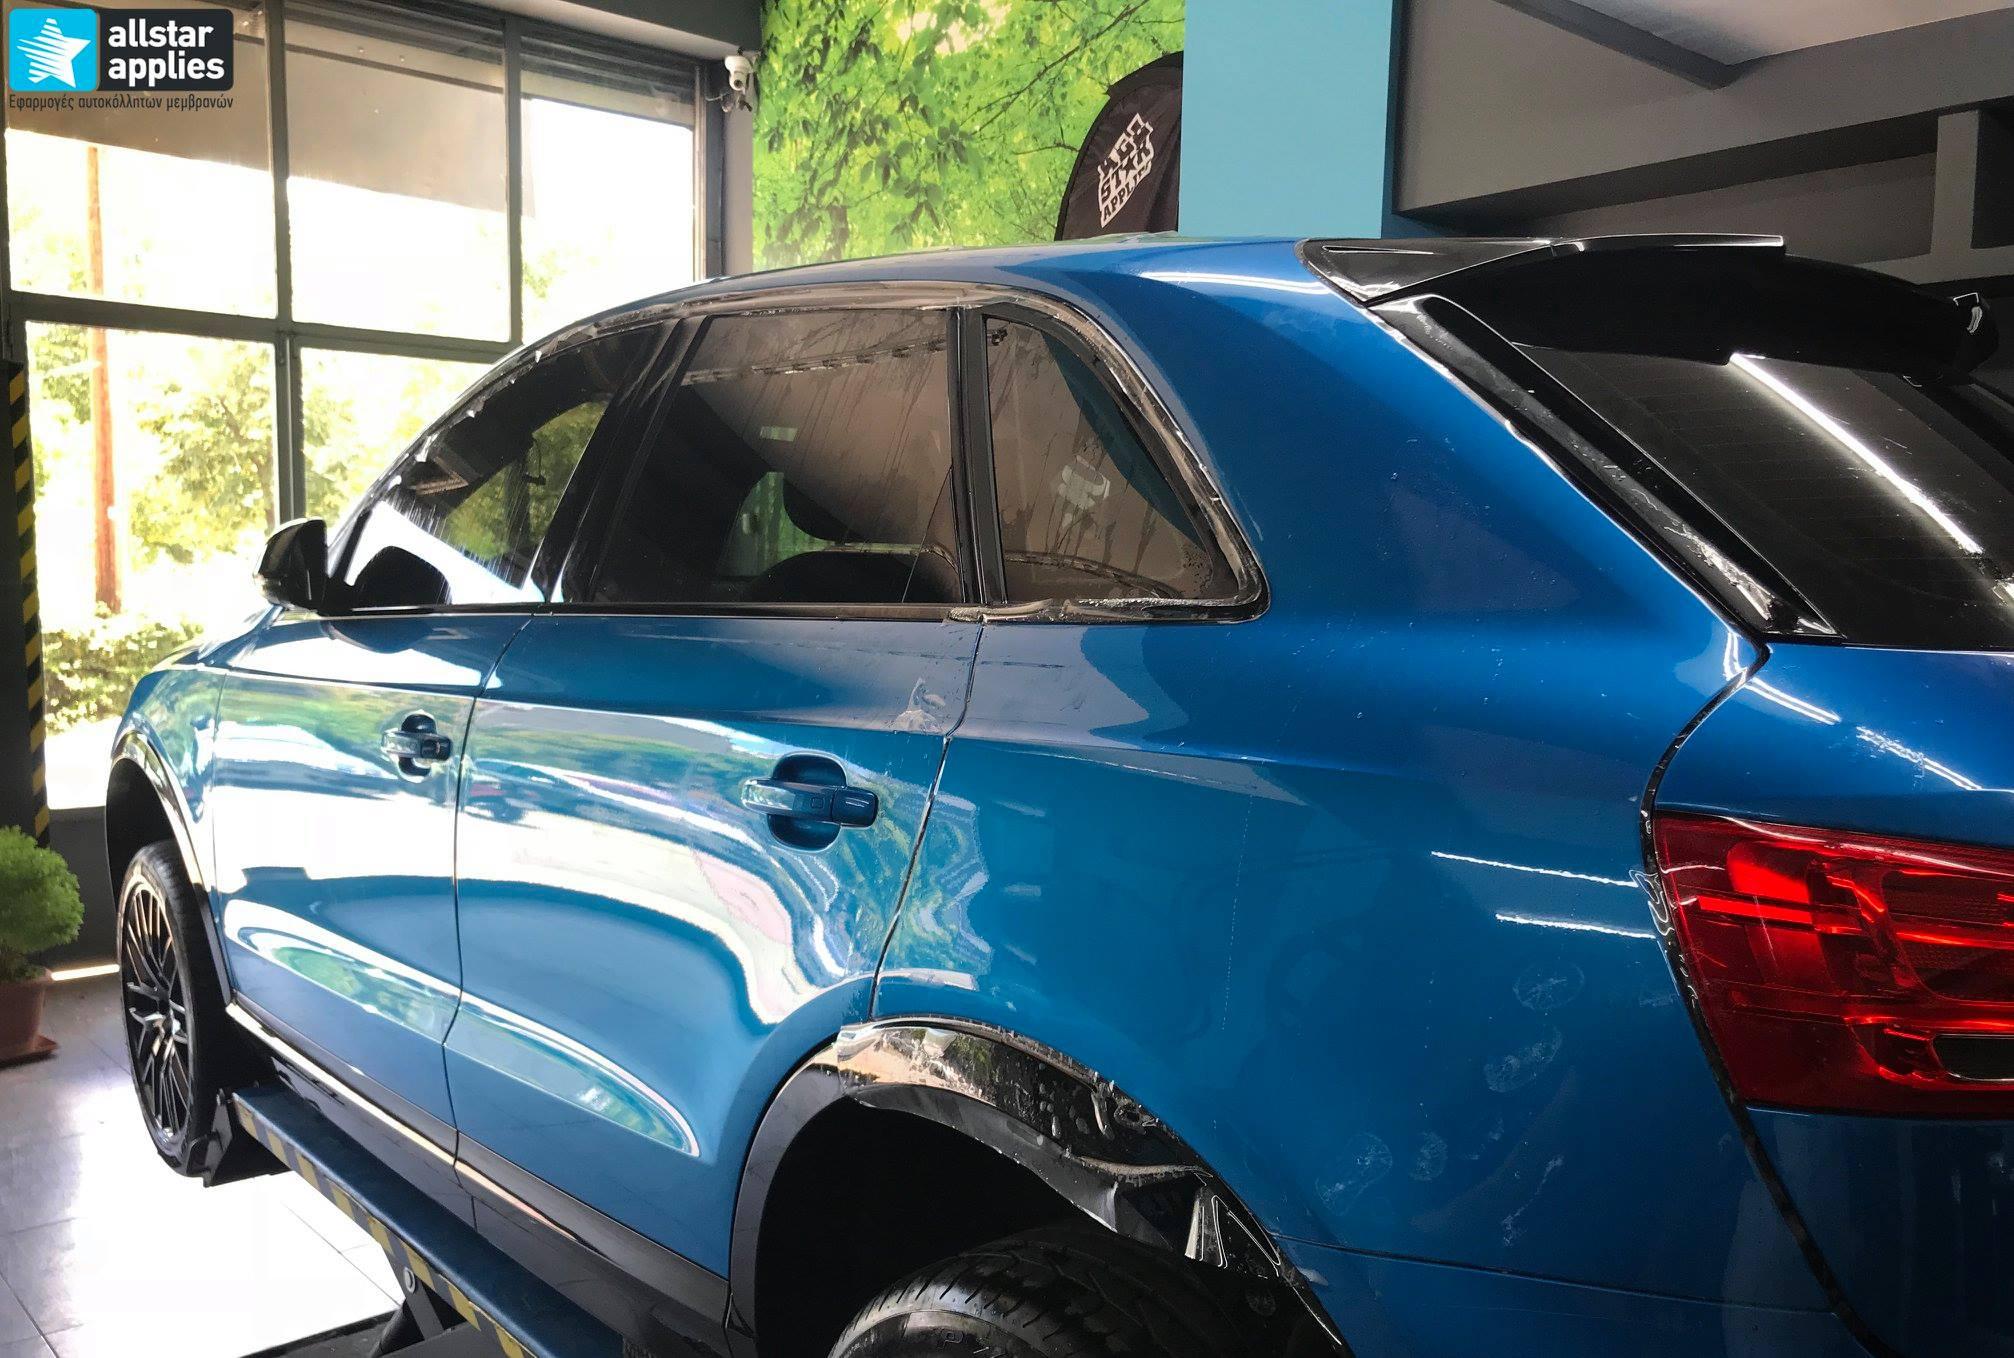 Audi Q3 – Μεμβράνες προστασίας χρώματος (Full Paint Protection Film) (10)